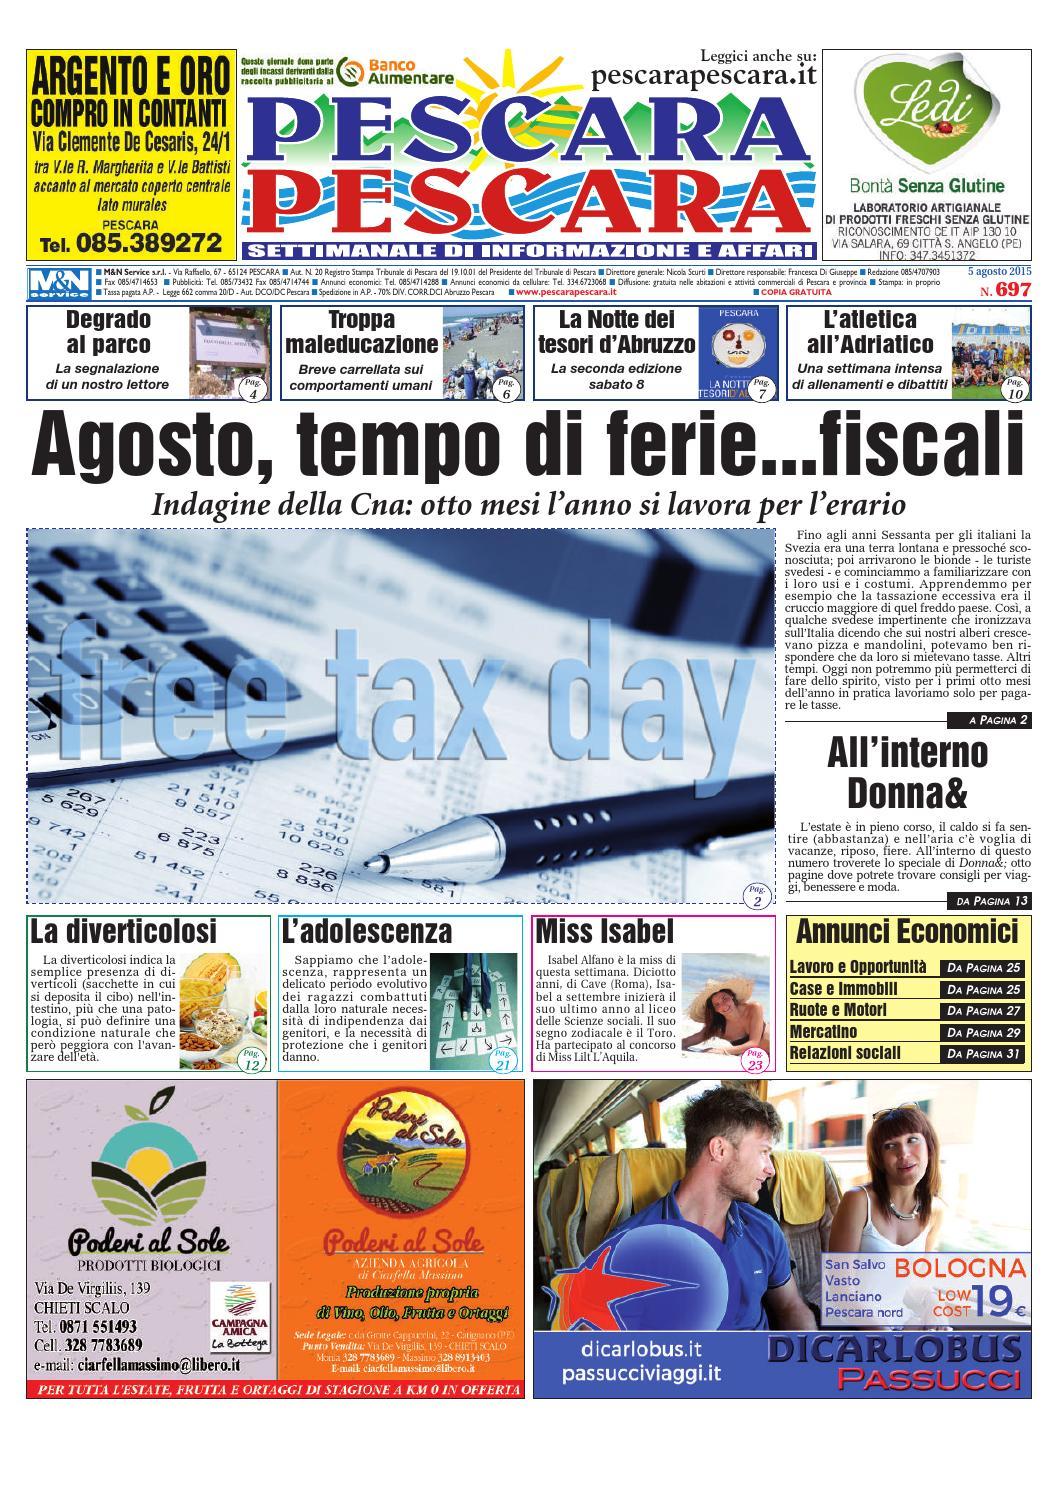 PescaraPescara n° 697 05 08 2015 by PescaraPescara - issuu a3e6f5fafd6